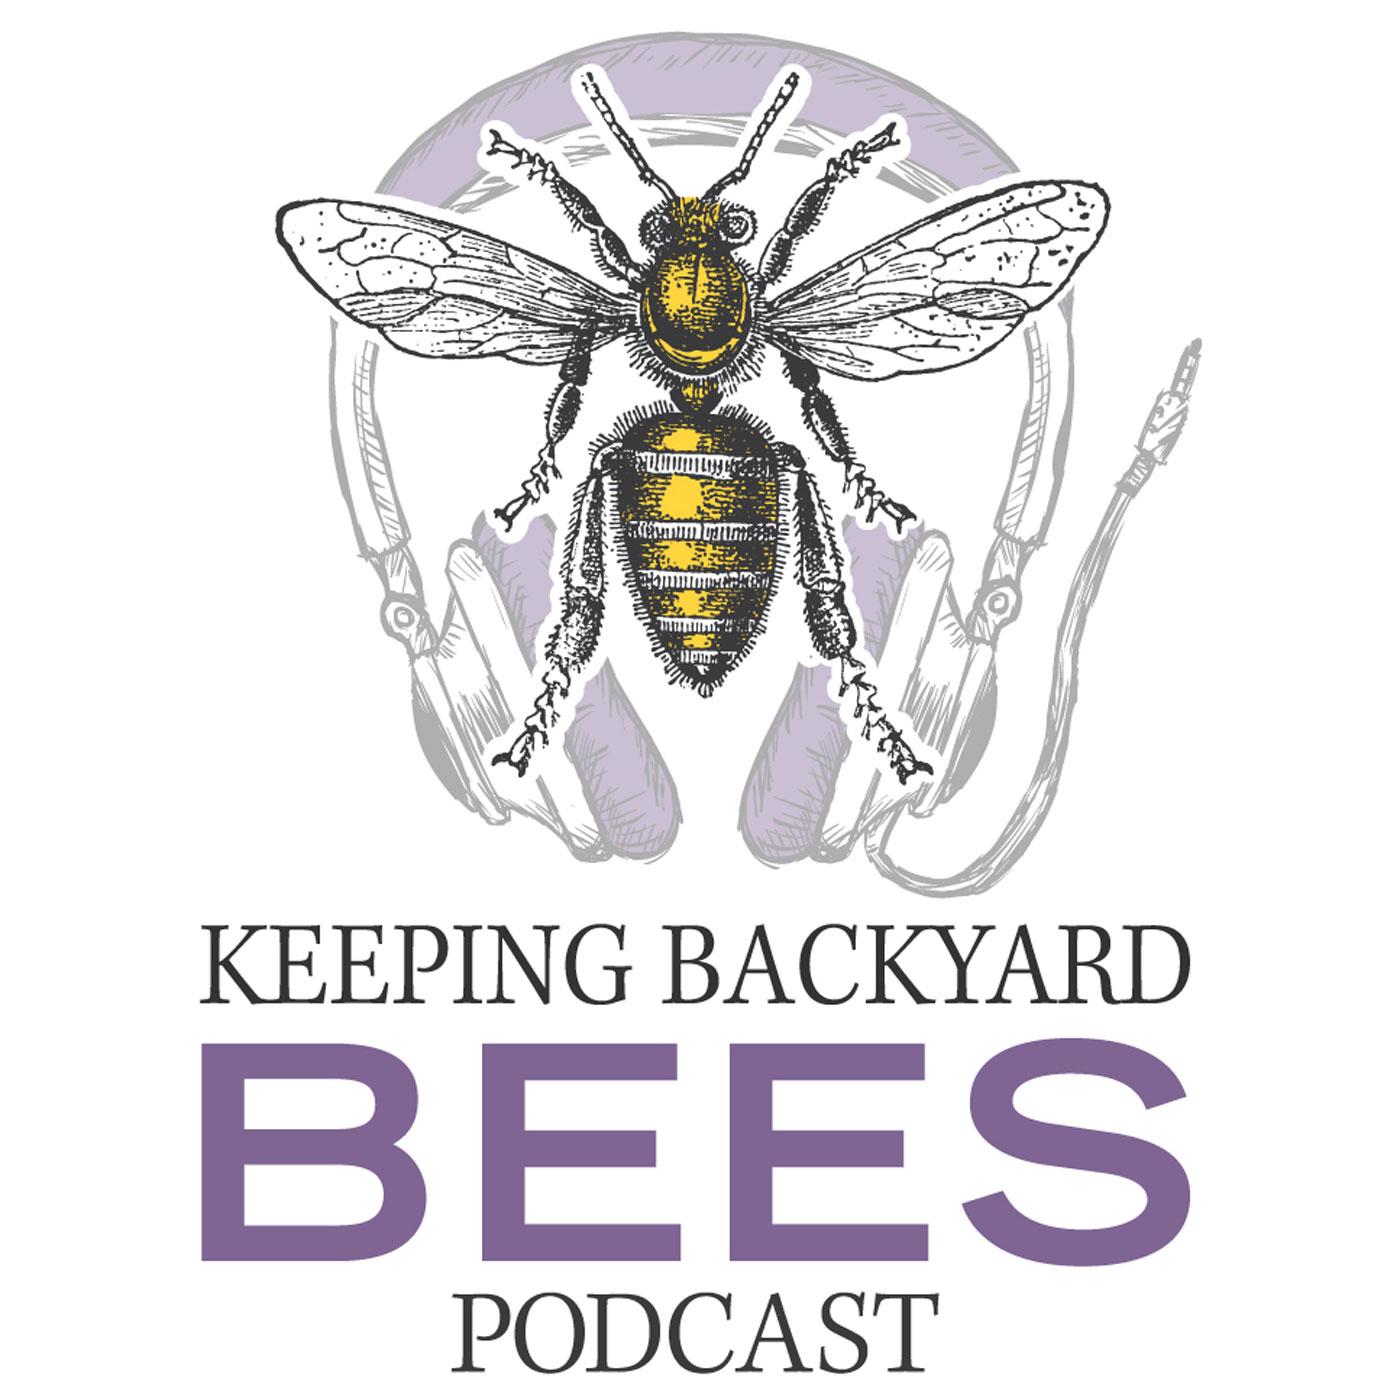 Keeping Backyard Bees show art